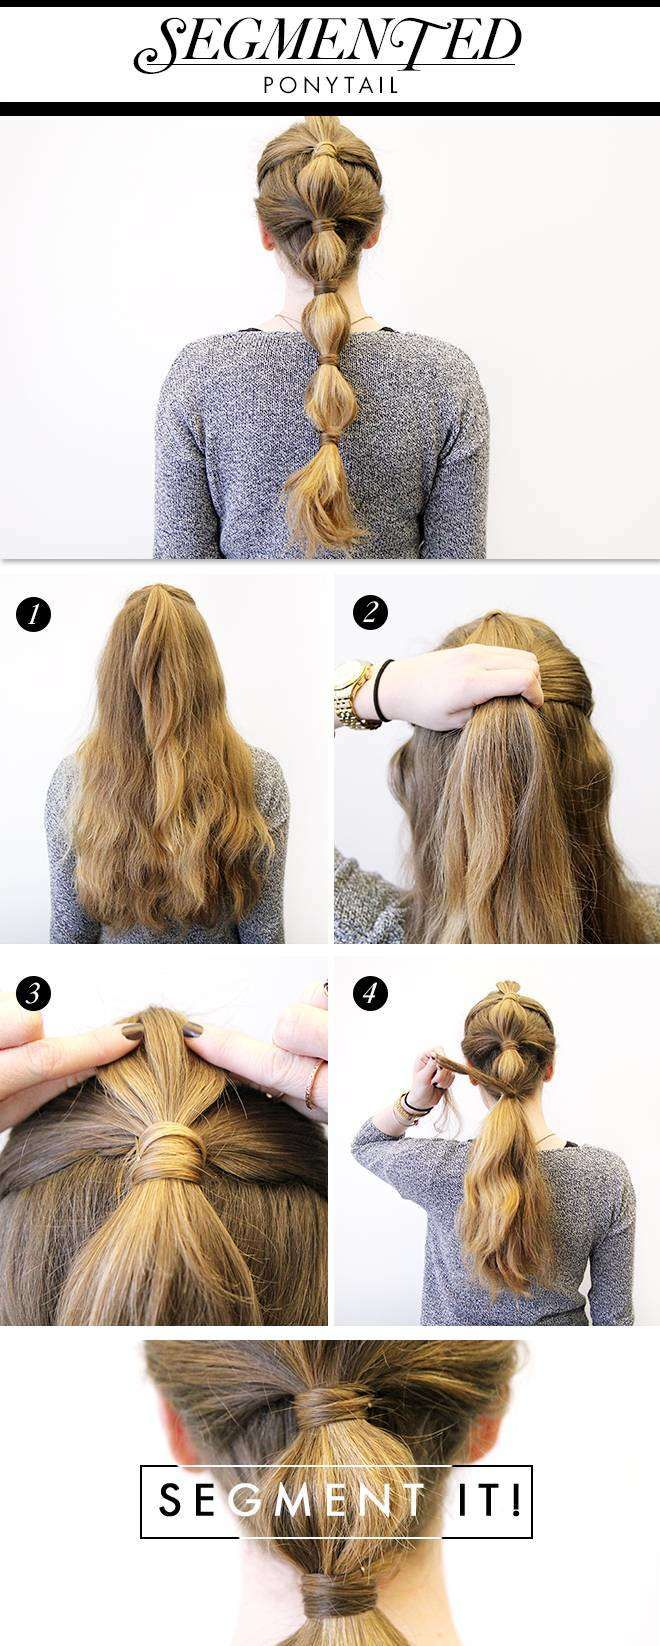 Segmented bubble ponytail